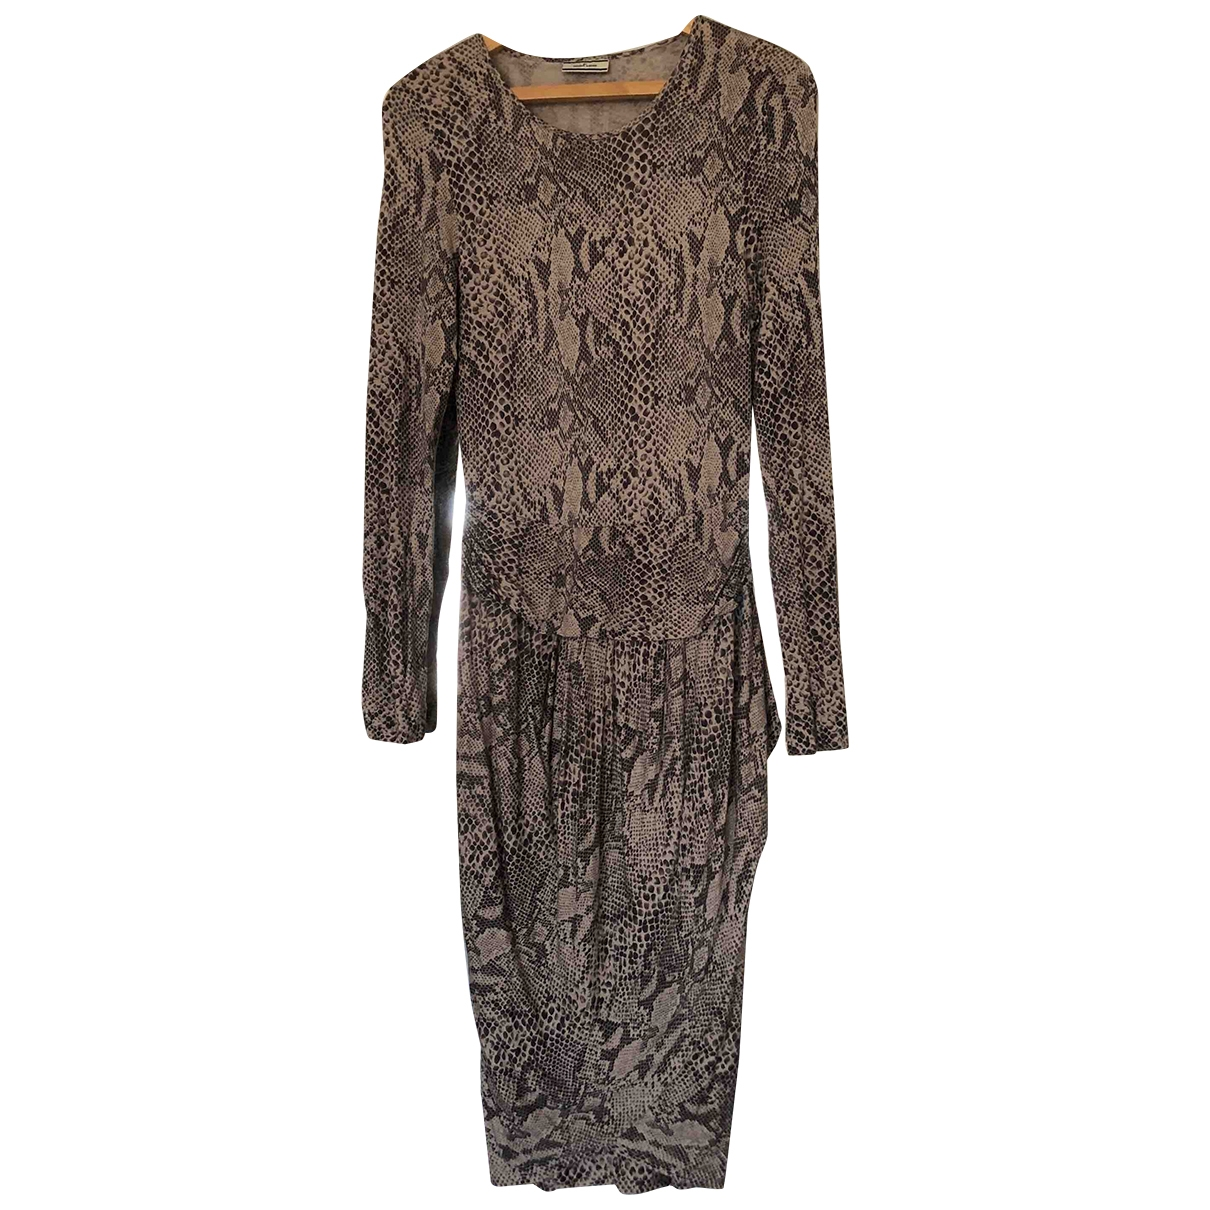 By Malene Birger \N dress for Women M International